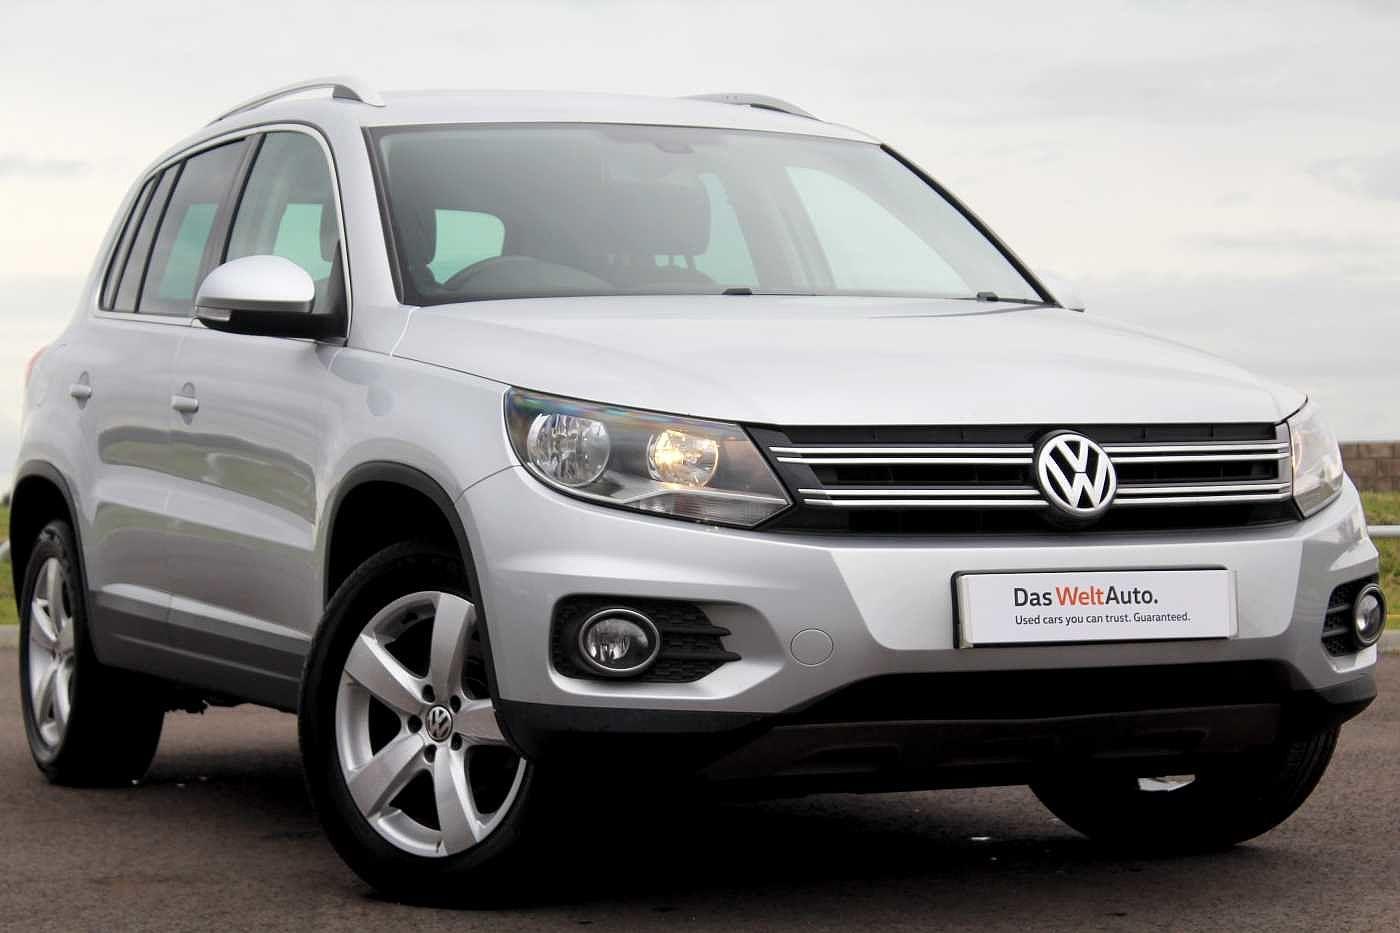 Volkswagen Tiguan 2.0TDI (140PS) 4WD Escape BlueMotion 5-Dr